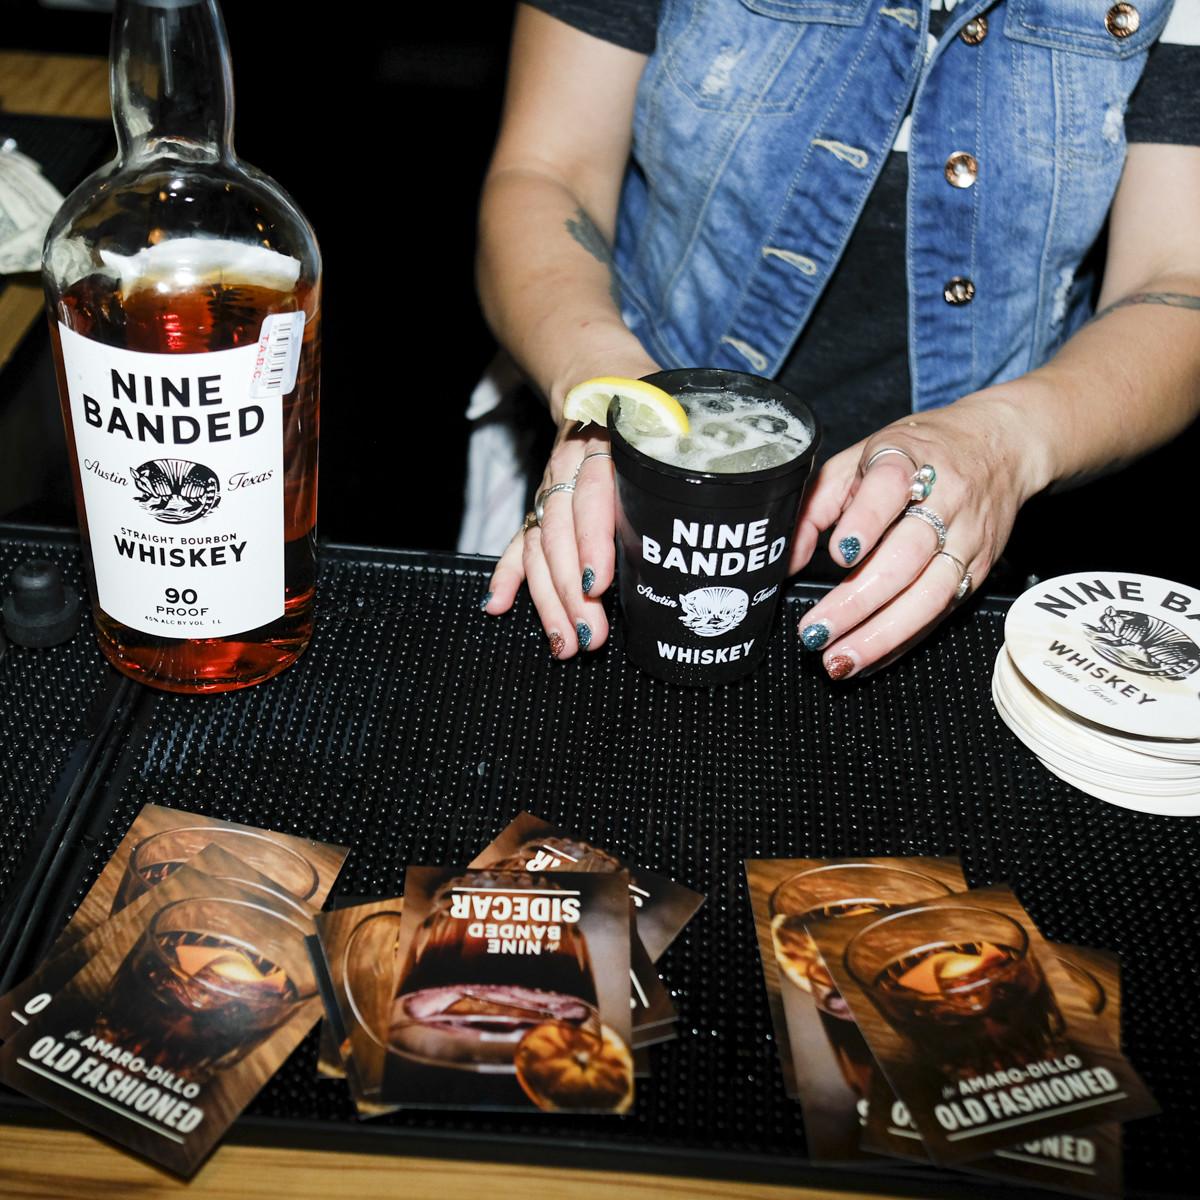 Nine Banded Whiskey bartender